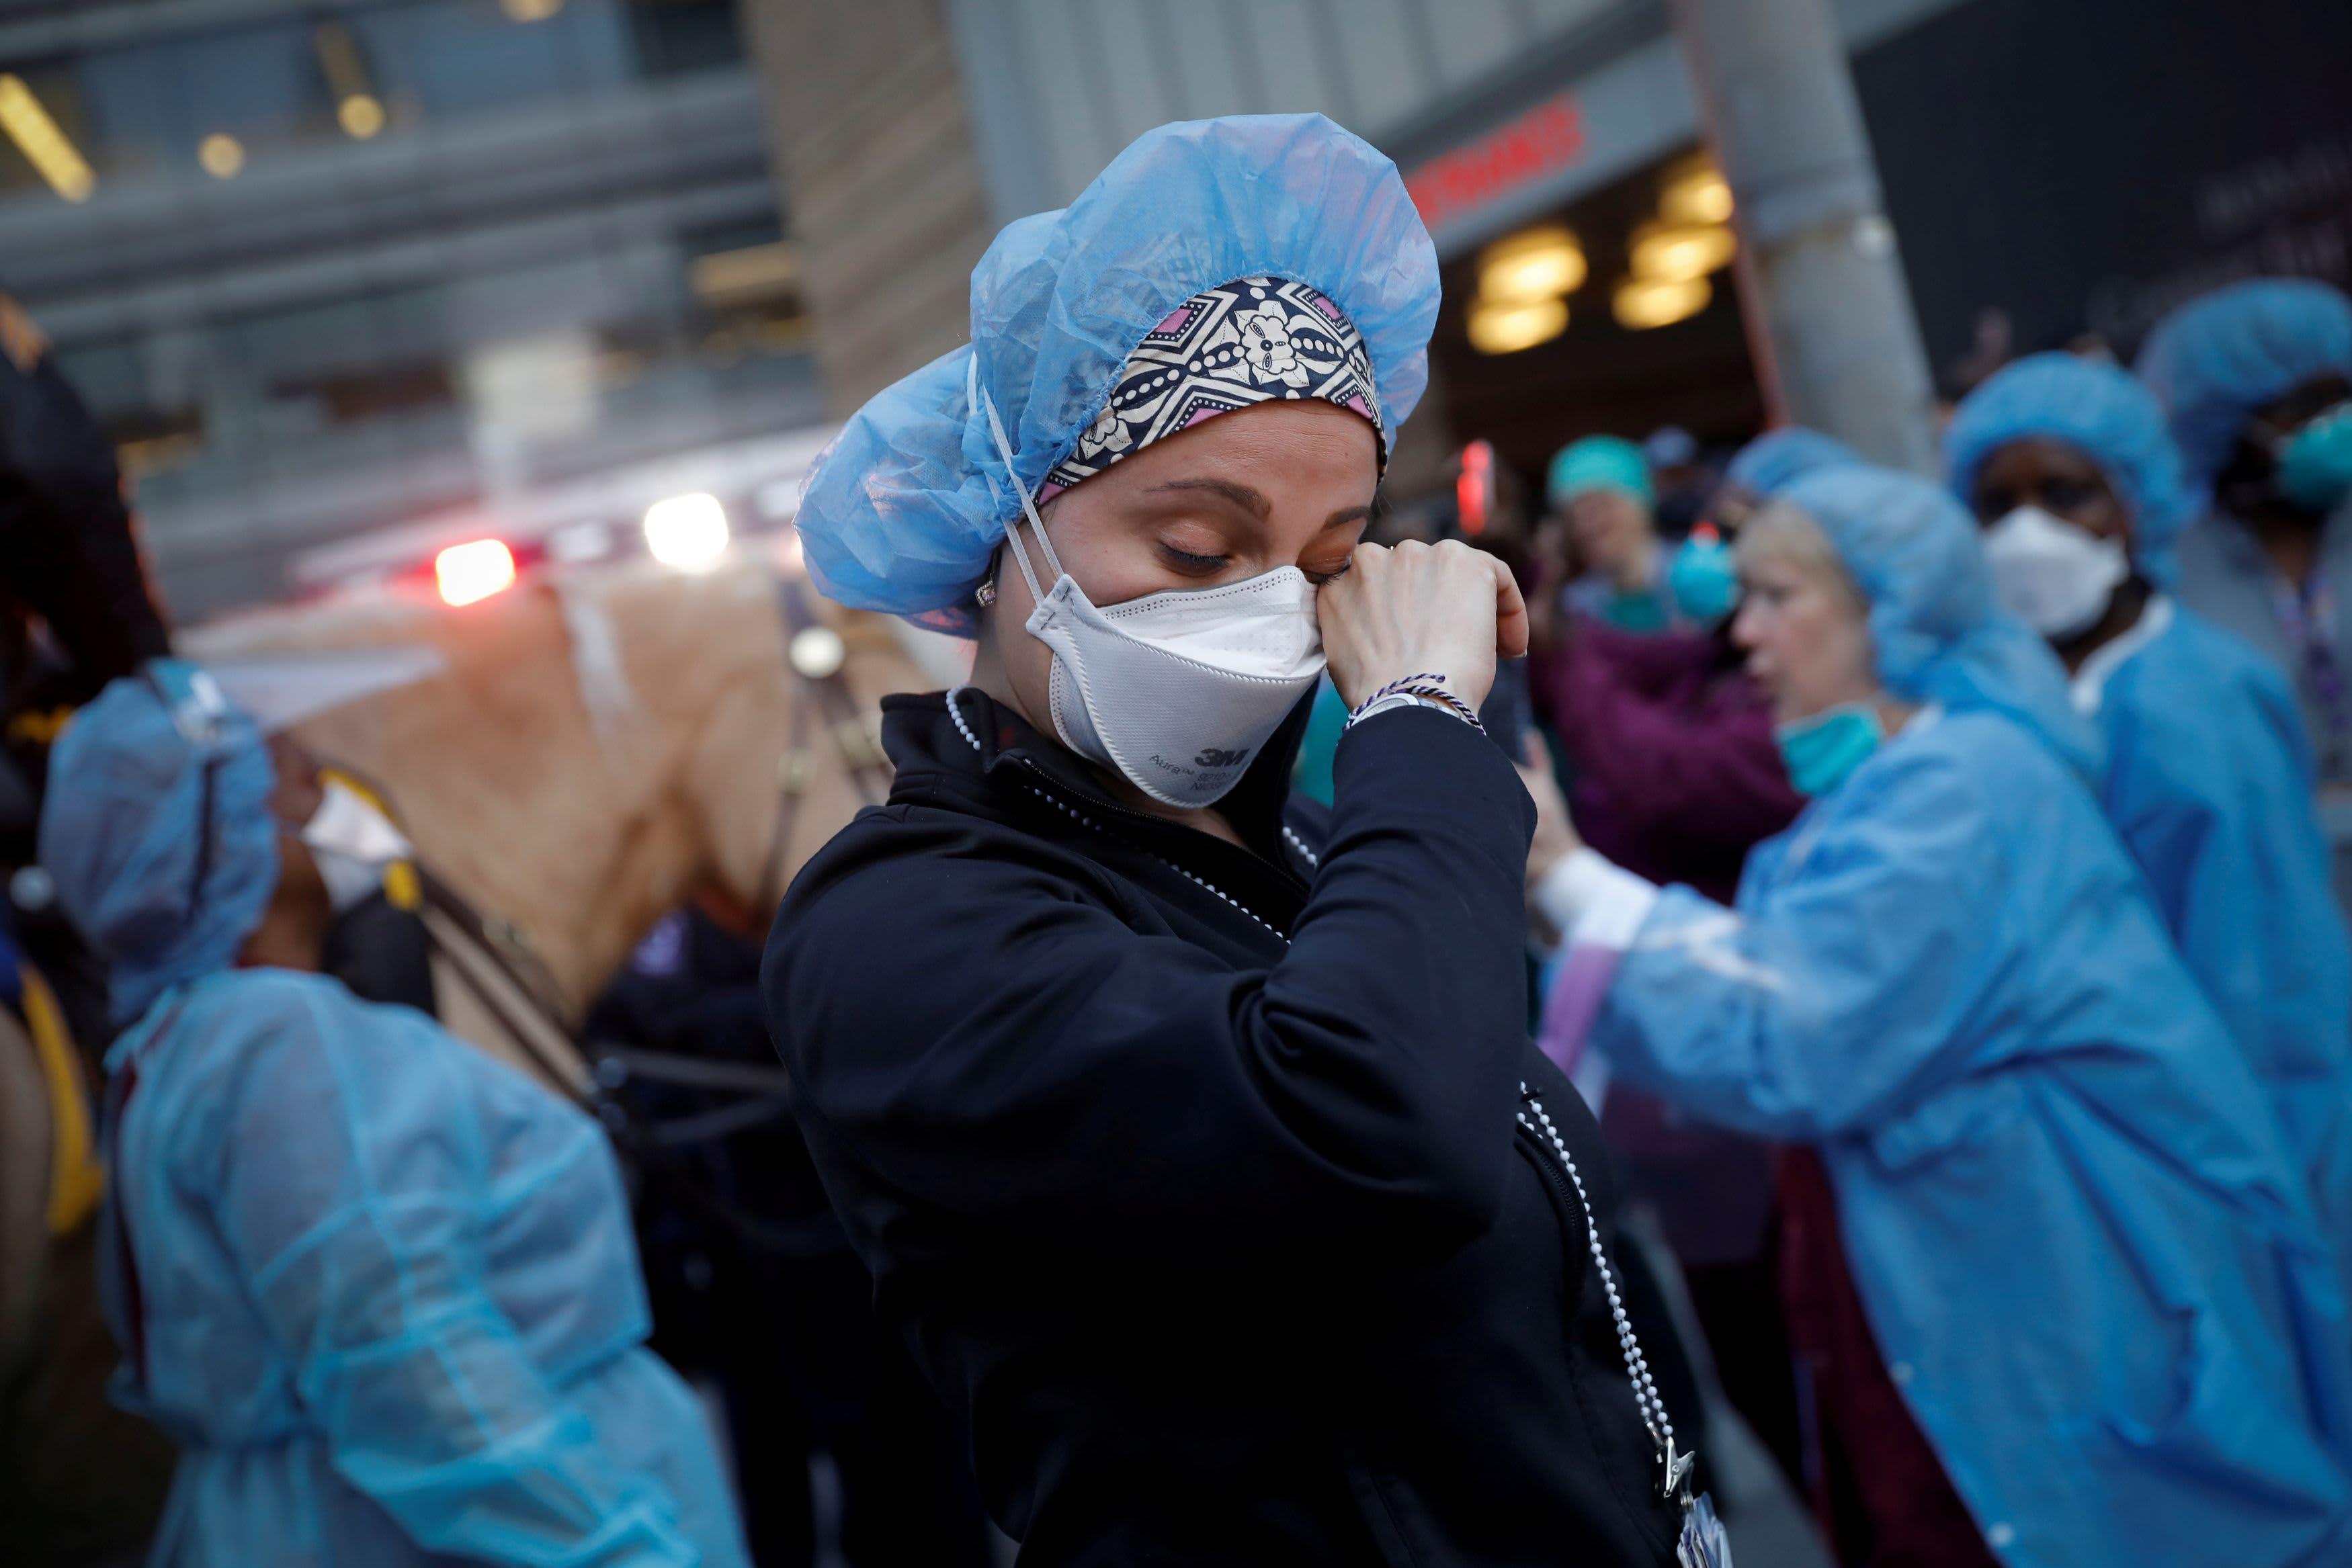 Coronavirus updates: US death toll surpasses 40,000 as cases hit 750,000